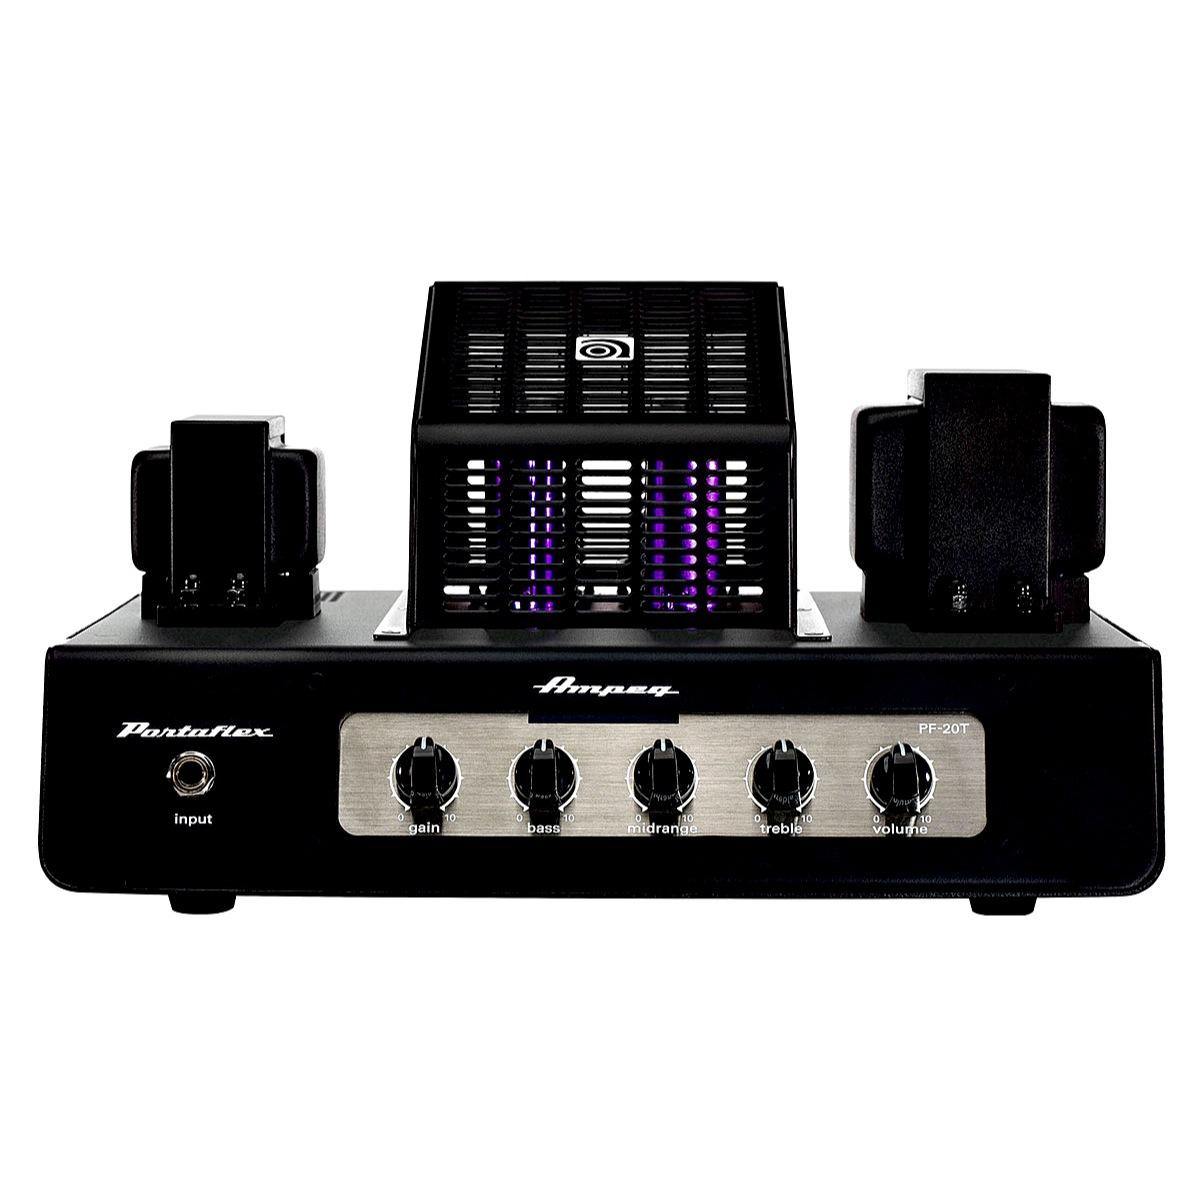 ampeg pf 20t portaflex 20w tube bass head sonic circus. Black Bedroom Furniture Sets. Home Design Ideas